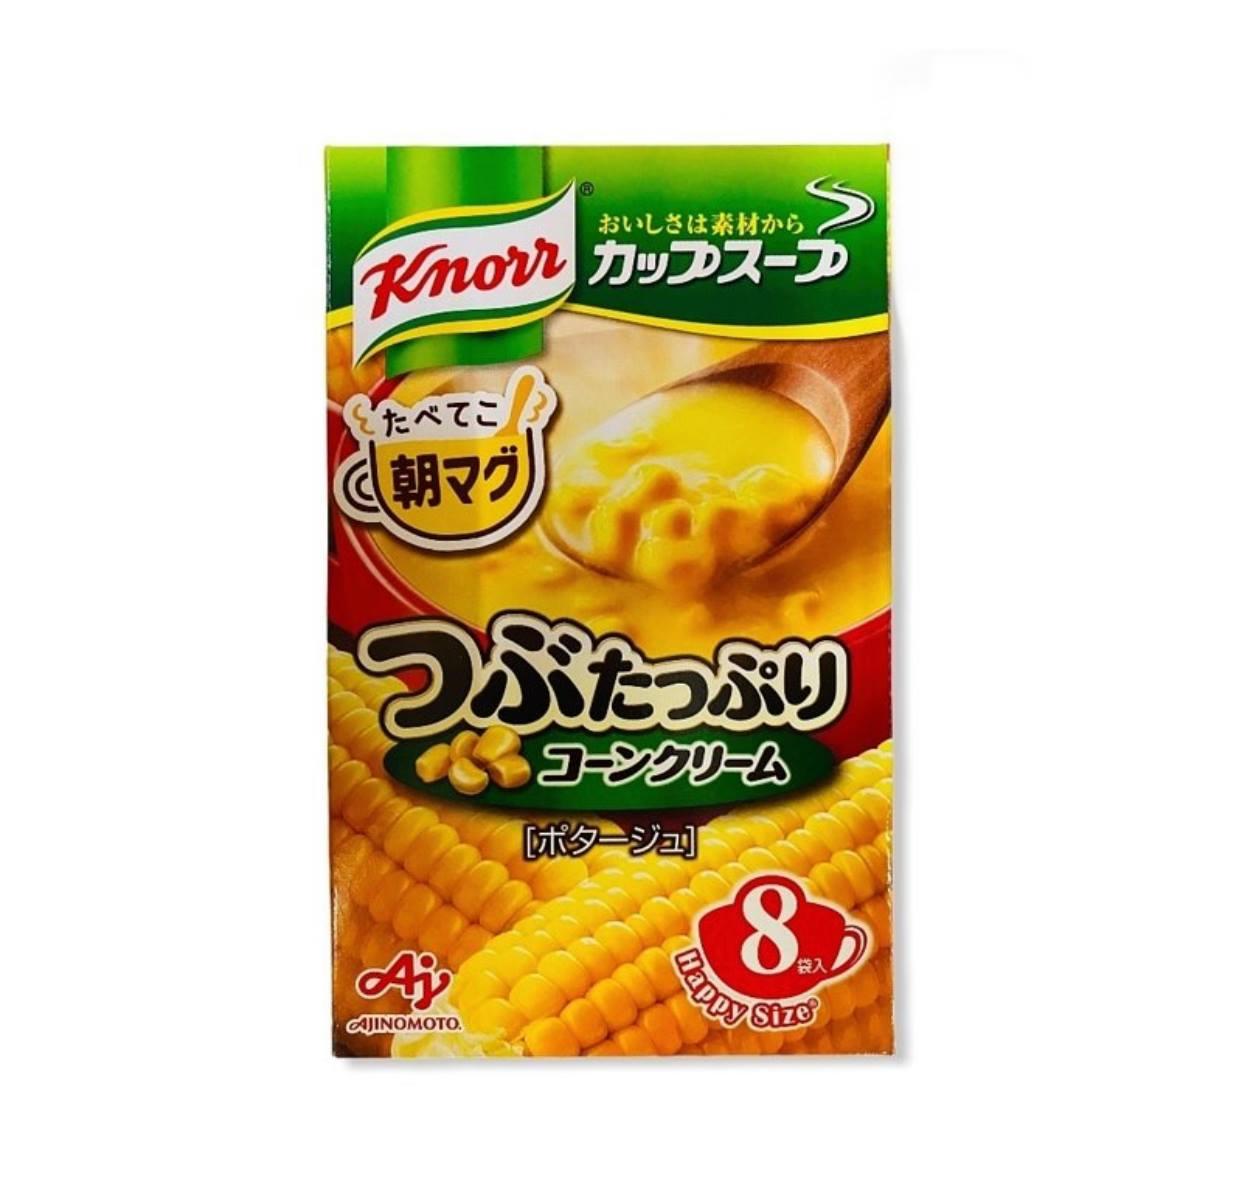 Ajinomoto味之素 Knorr玉米濃湯系列-顆粒玉米 8袋入